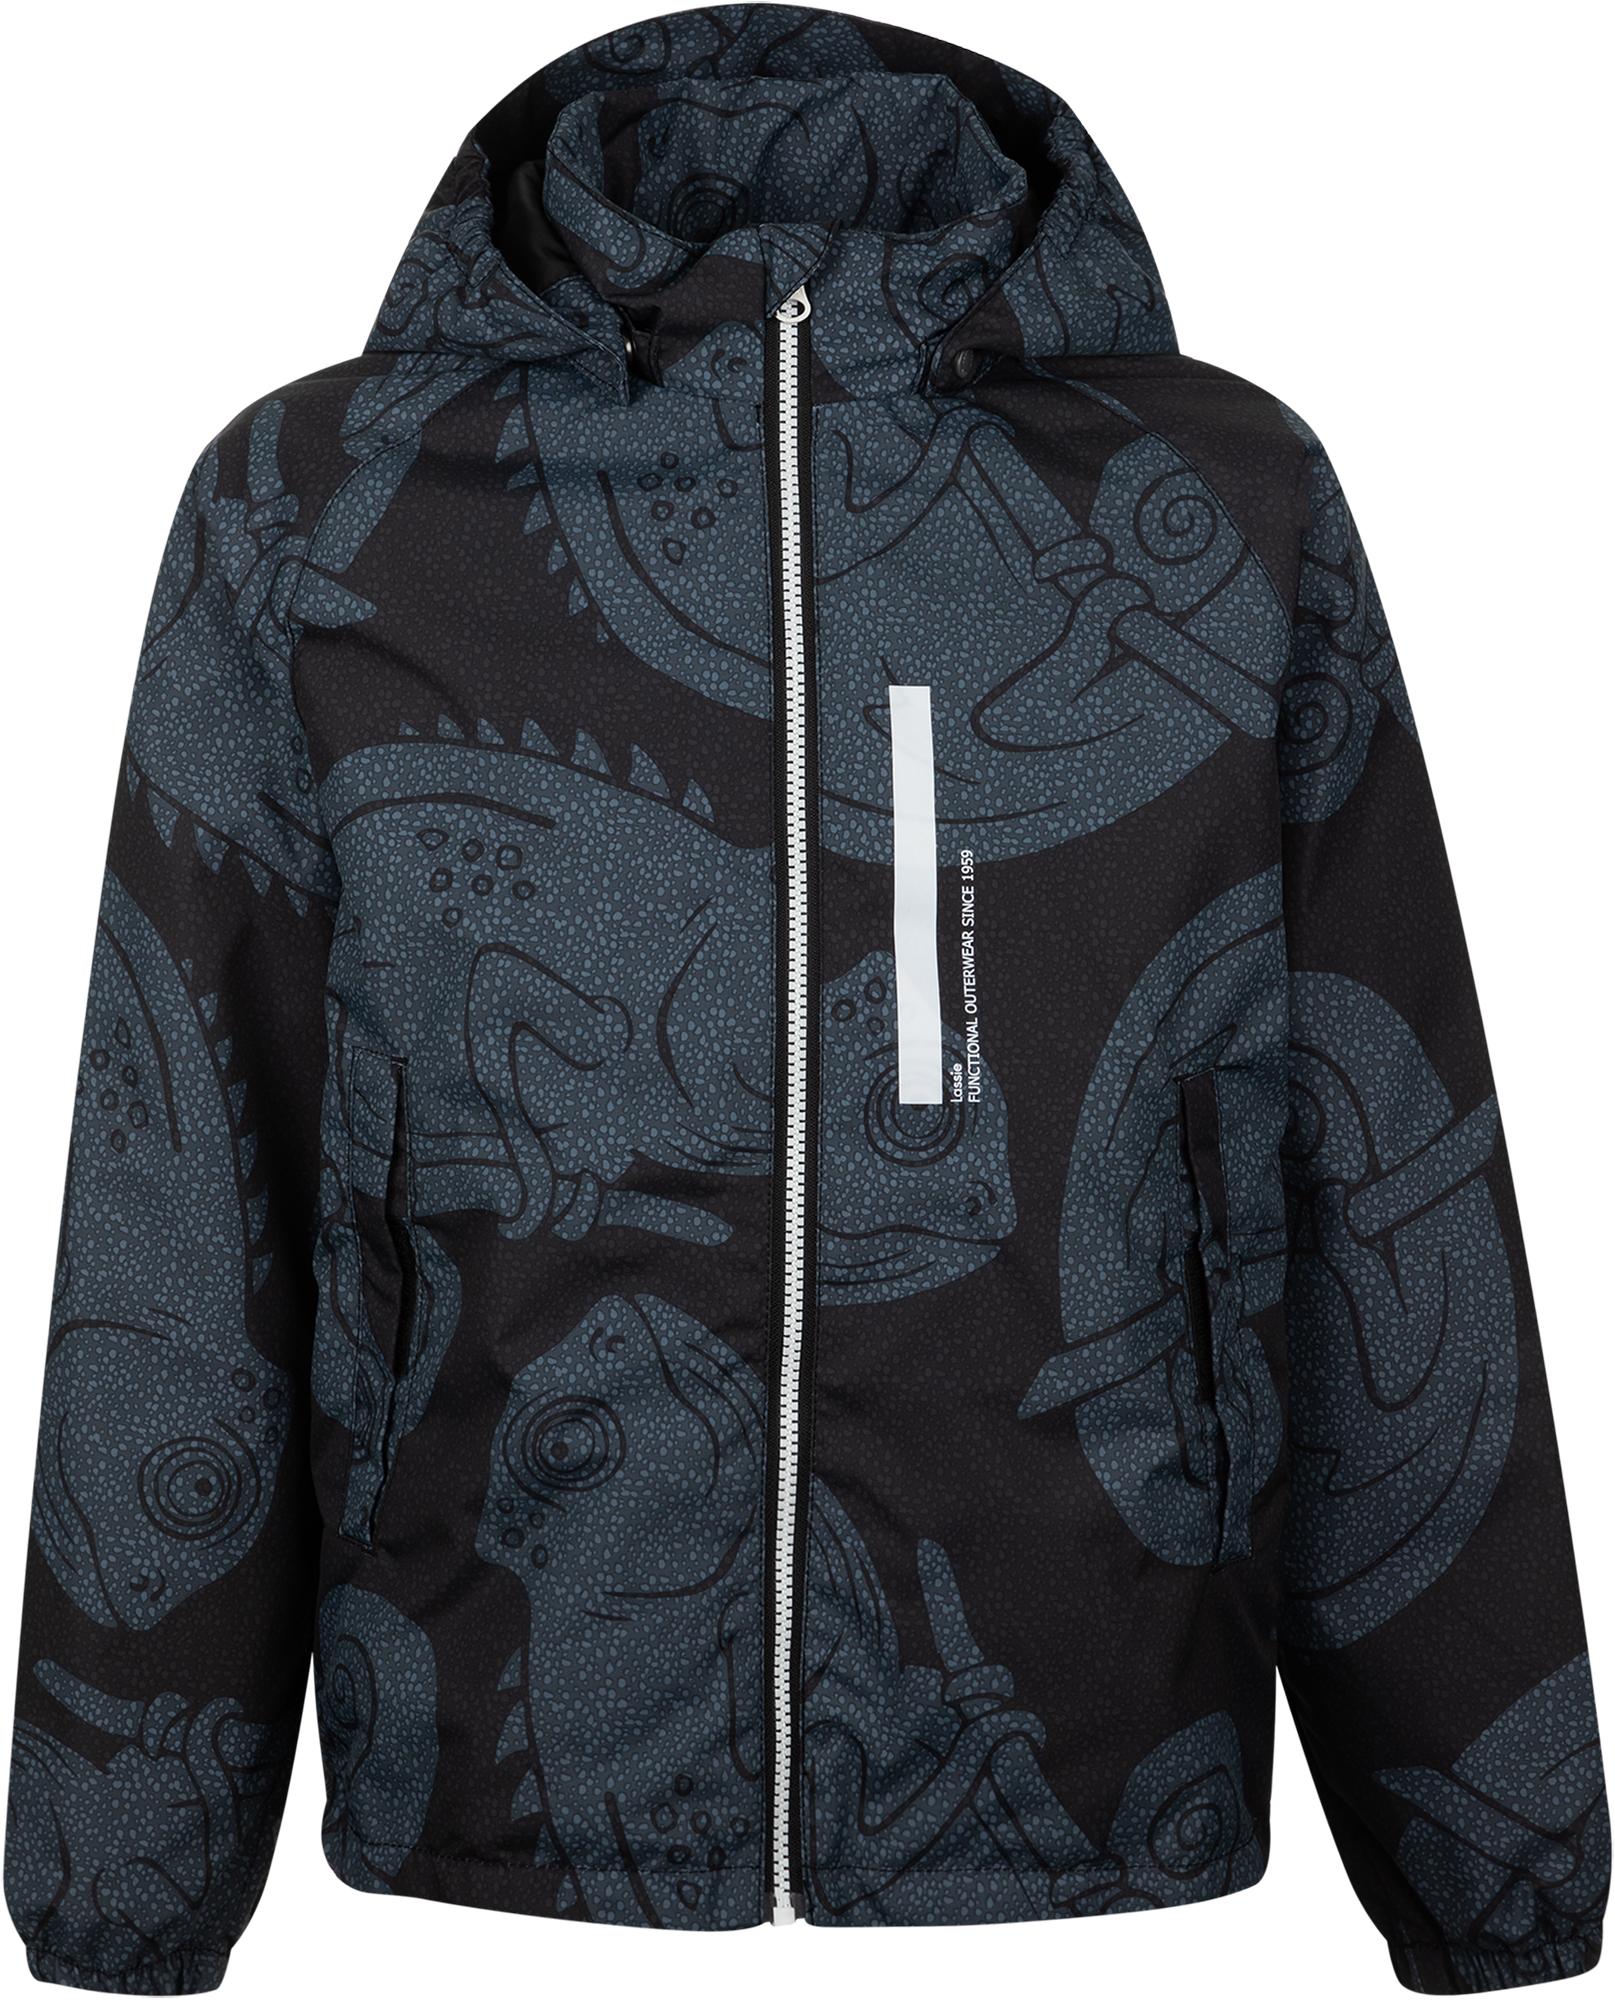 цена на Lassie Куртка утепленная для мальчиков LASSIE Kaspian, размер 140